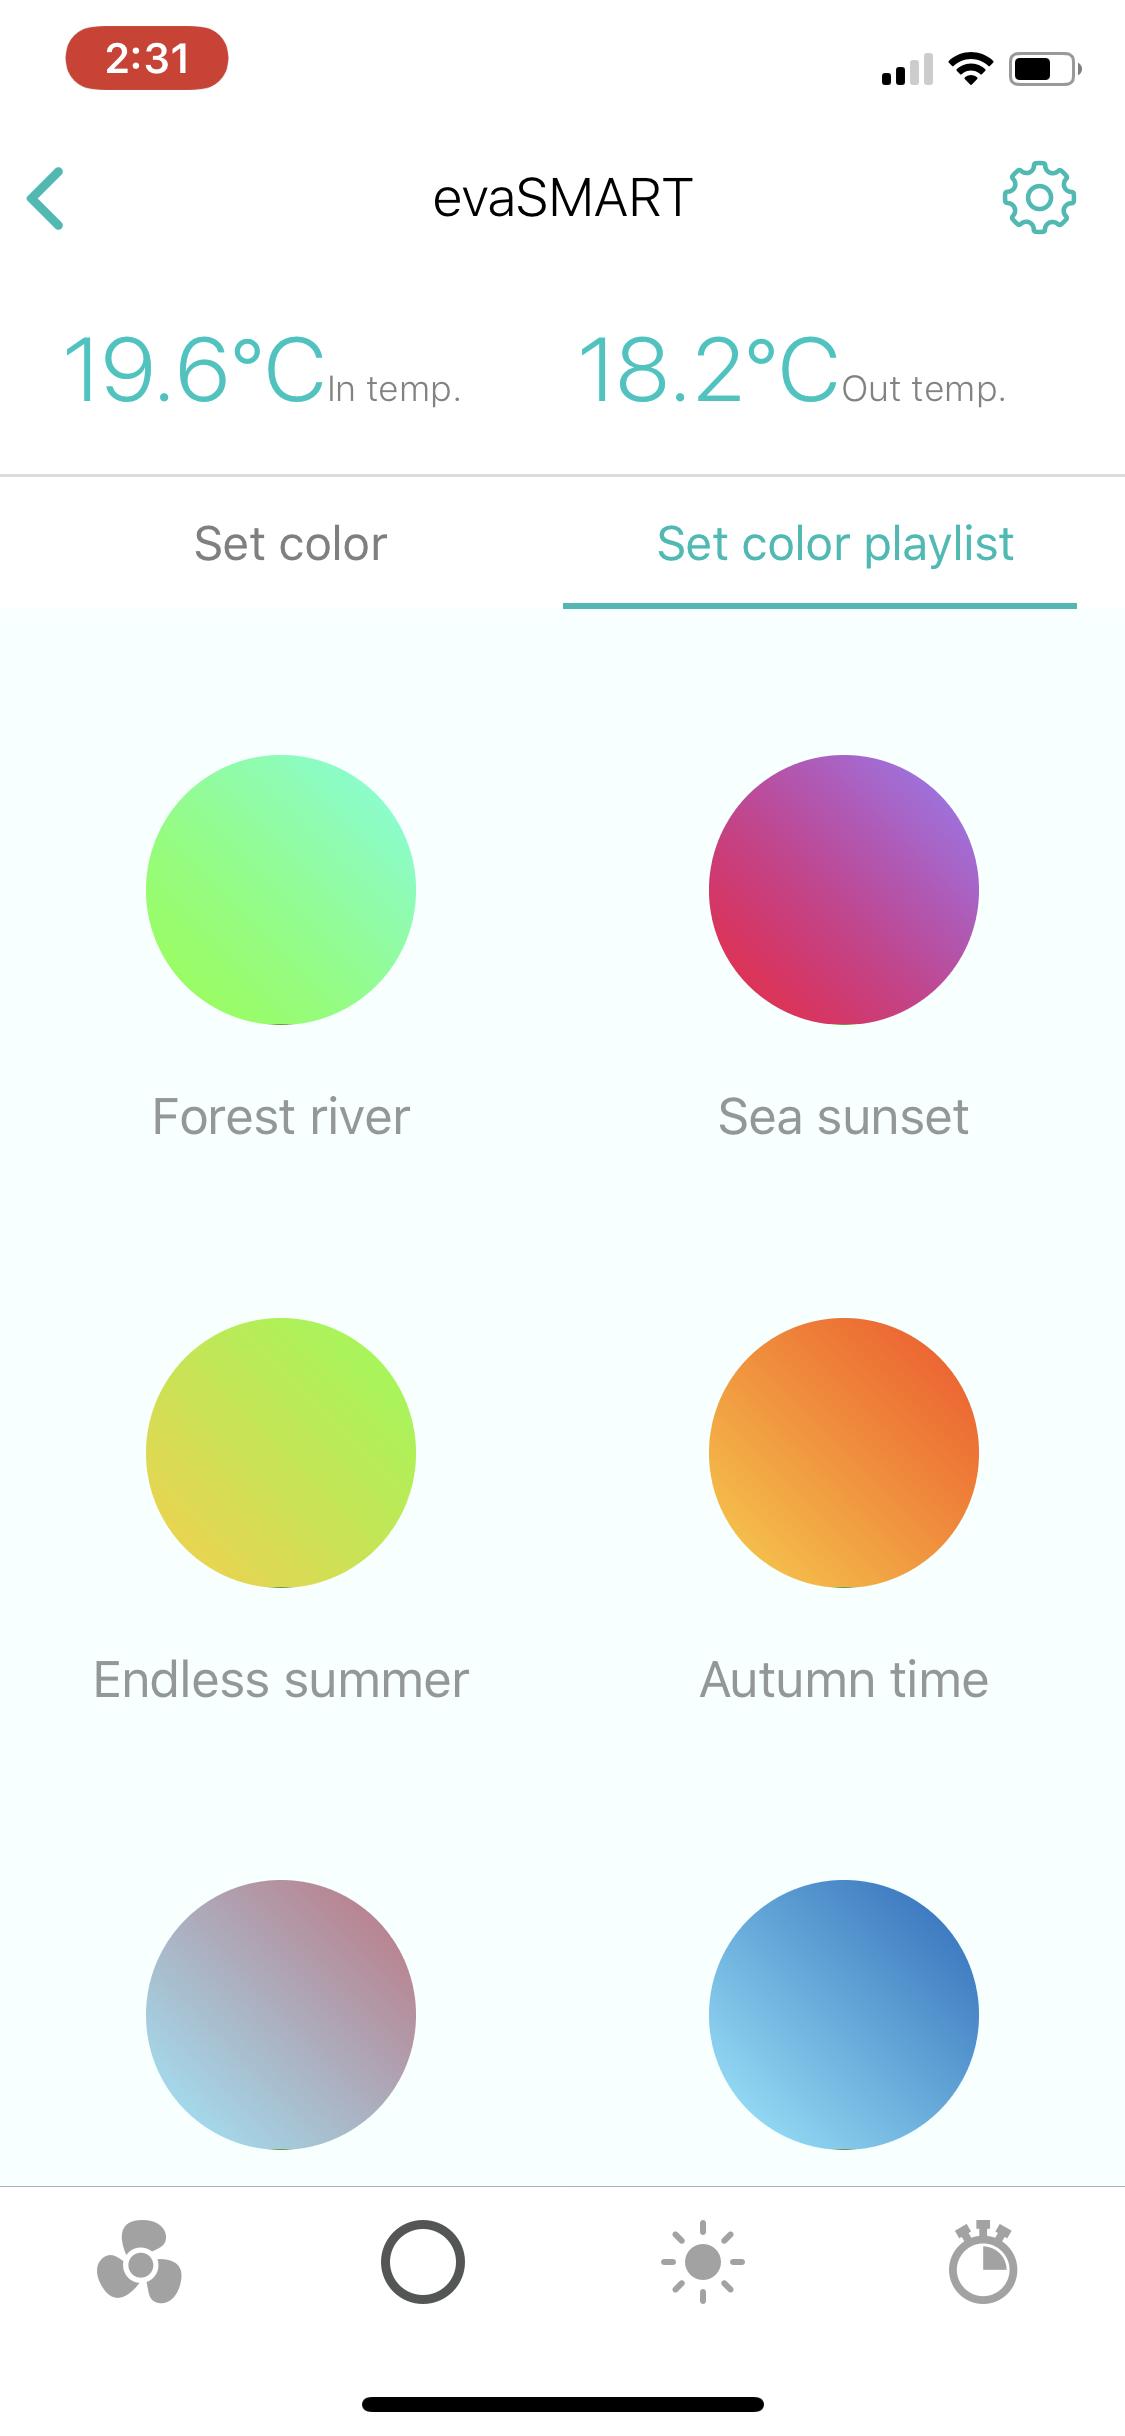 evaSMART colours